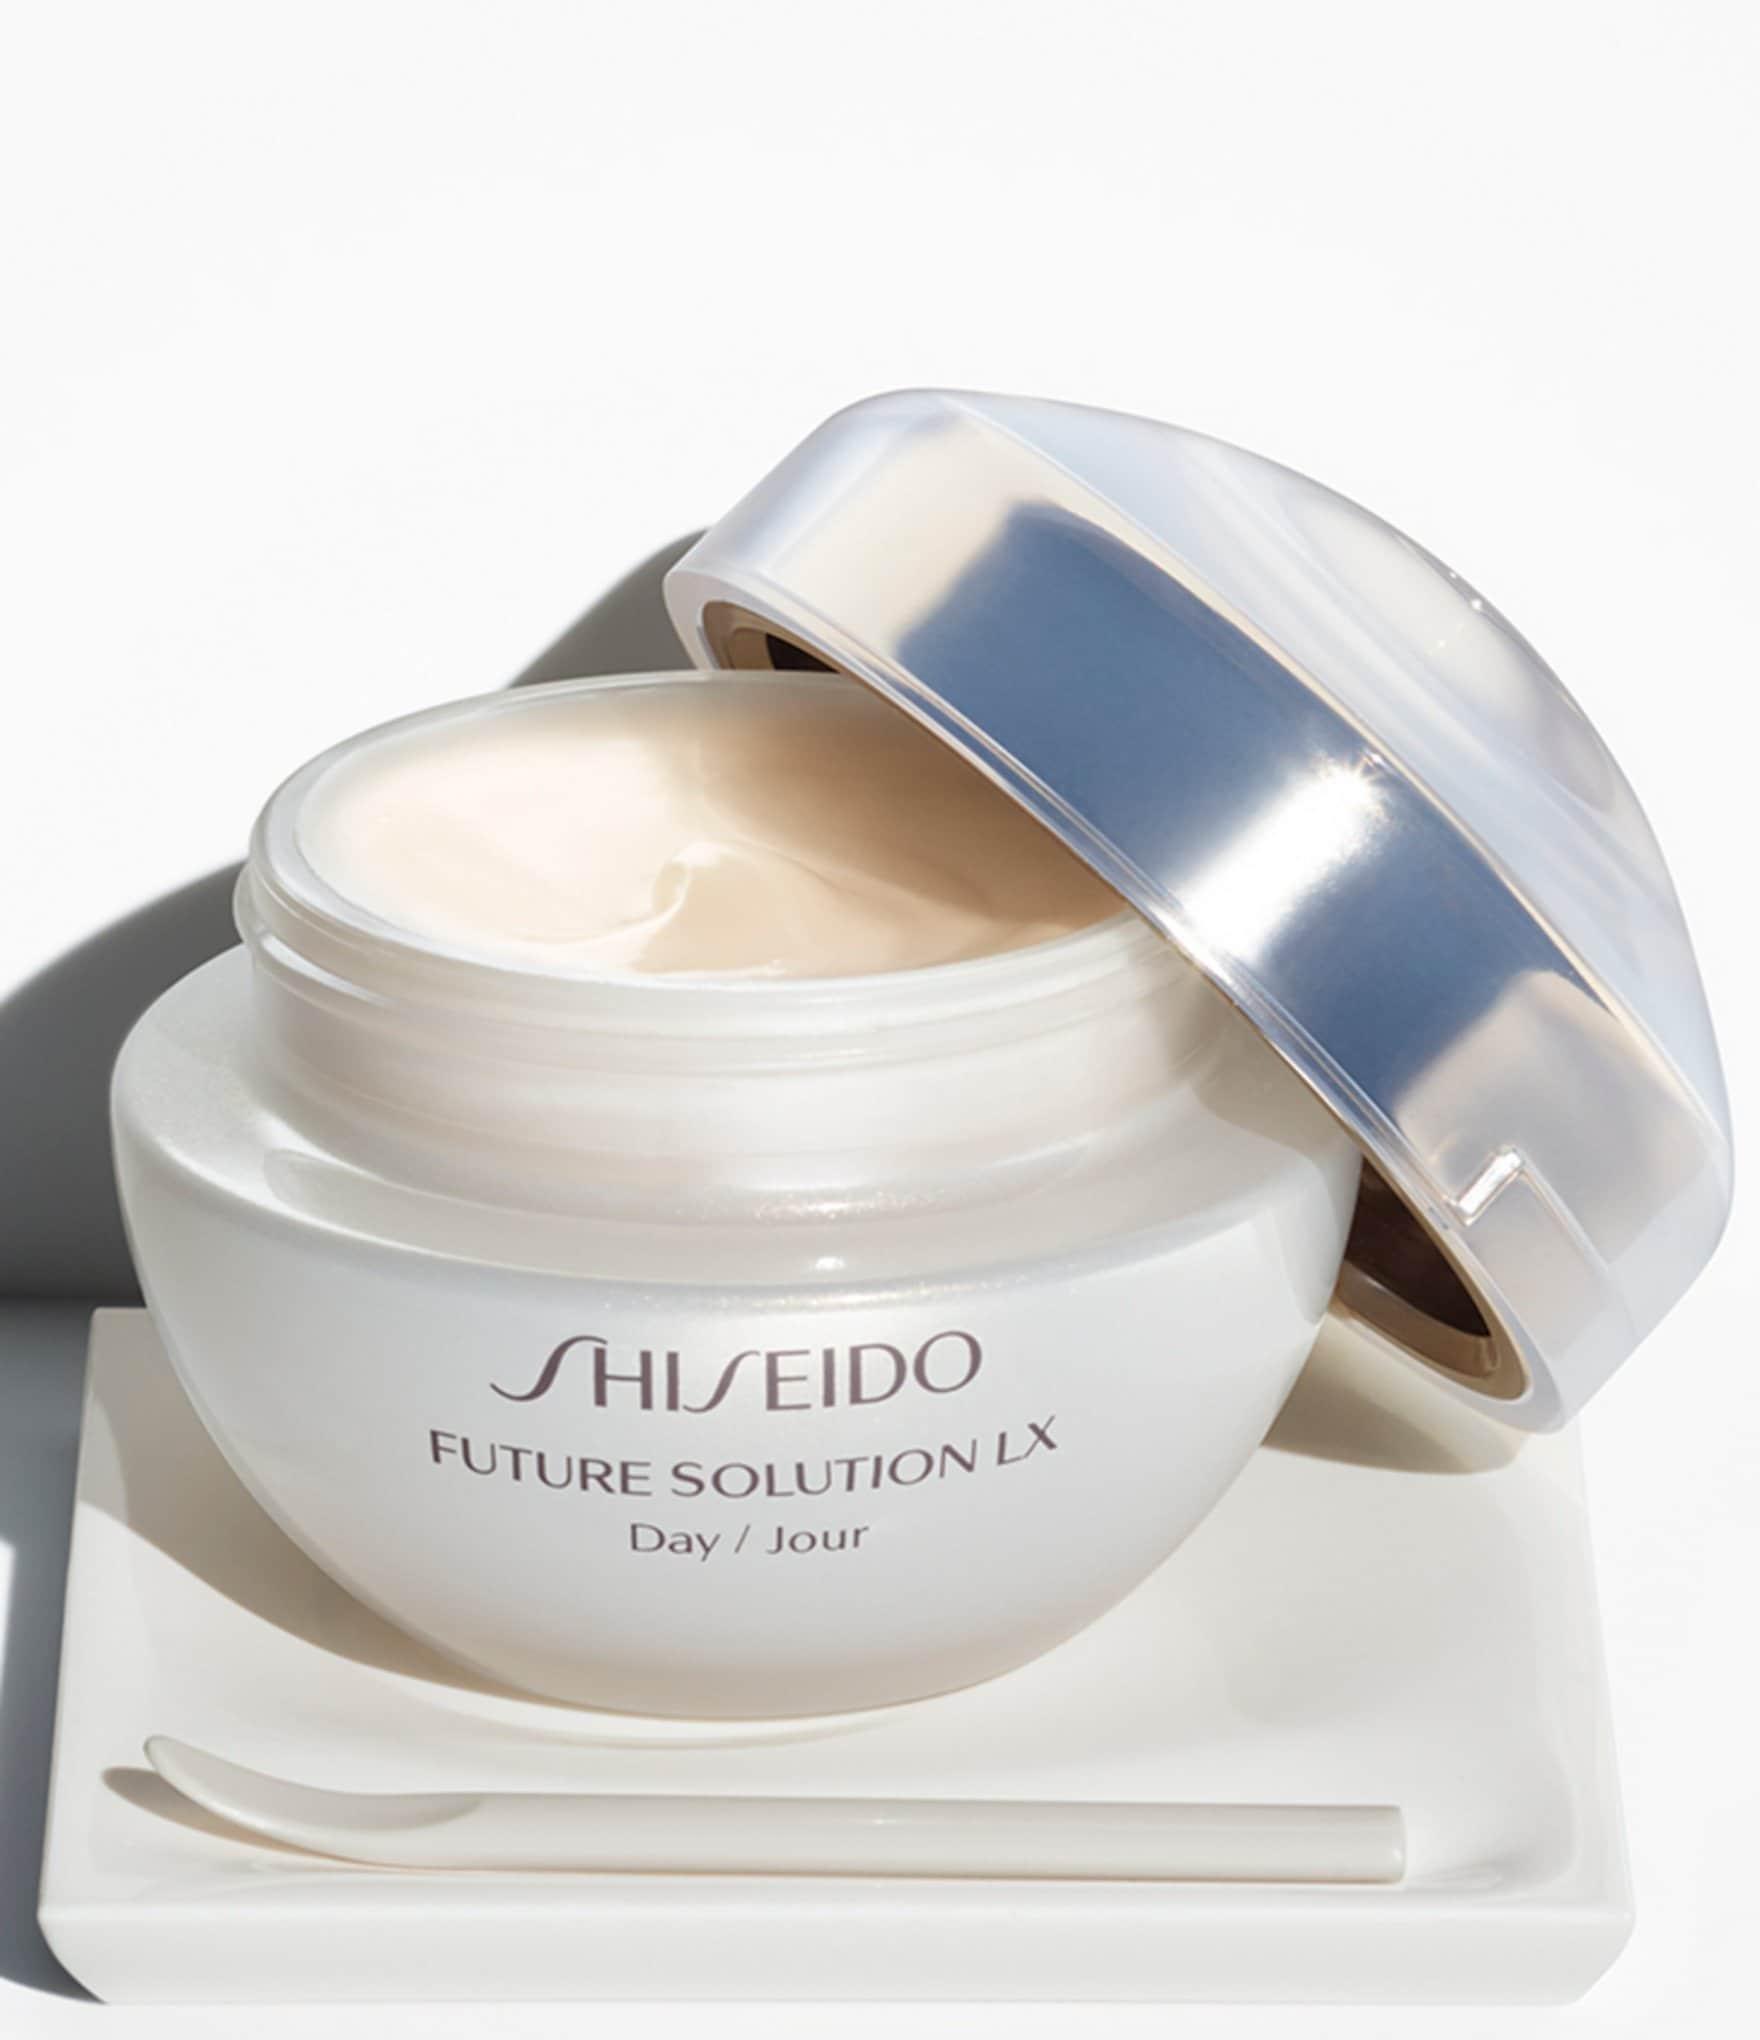 shiseido future solution review